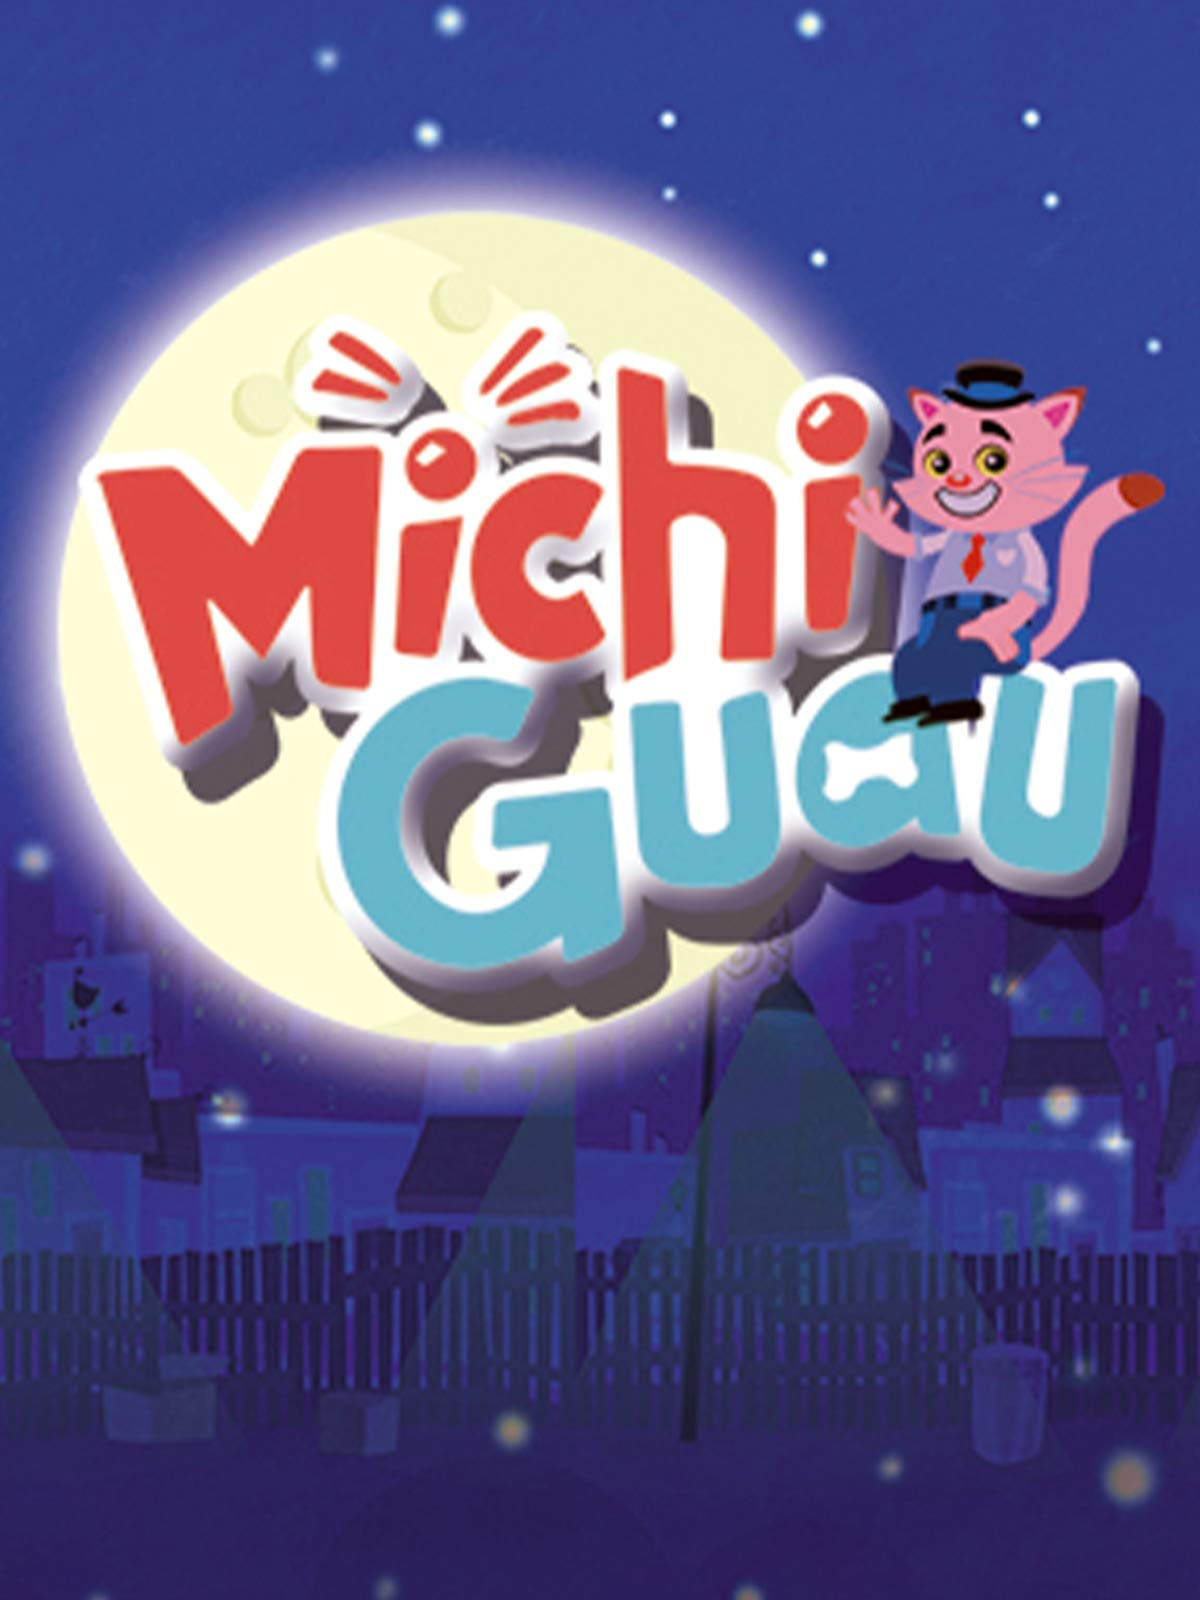 Michi-Guau